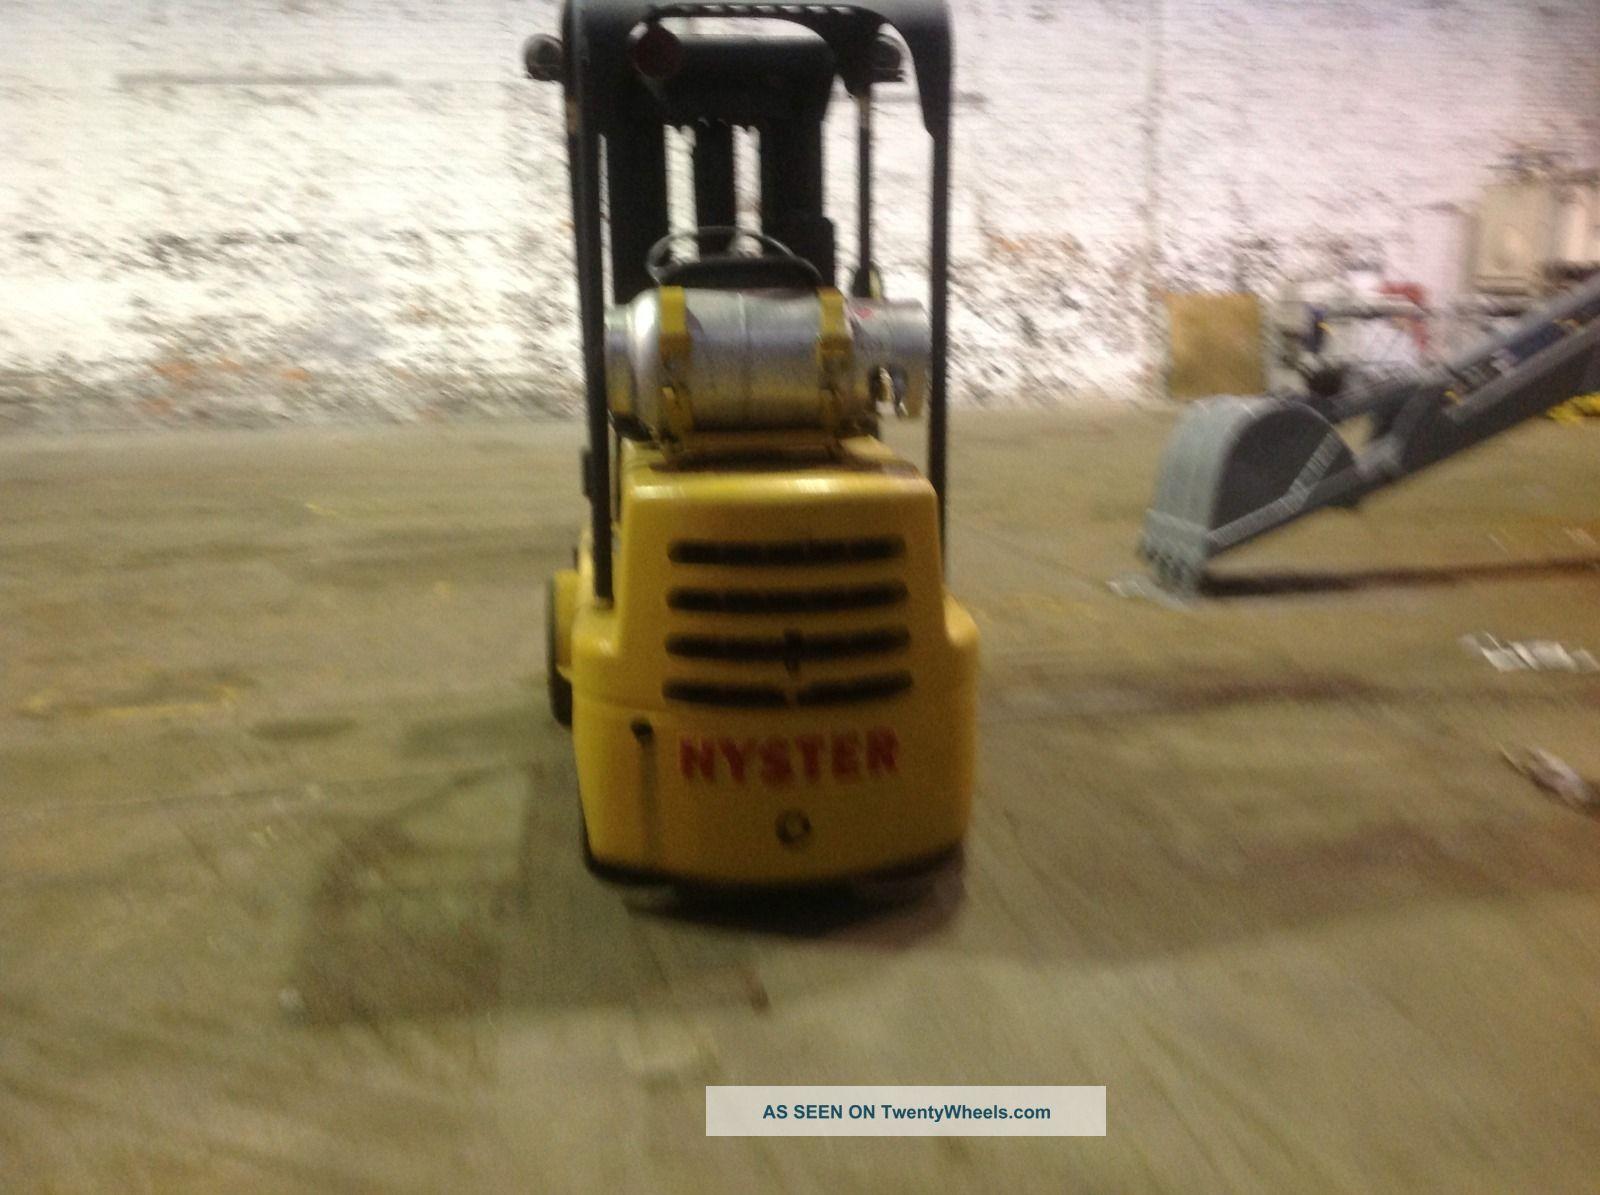 Hyster H50 Forklift Wiring Diagram Images Of Home Design Schematics Hydraulic